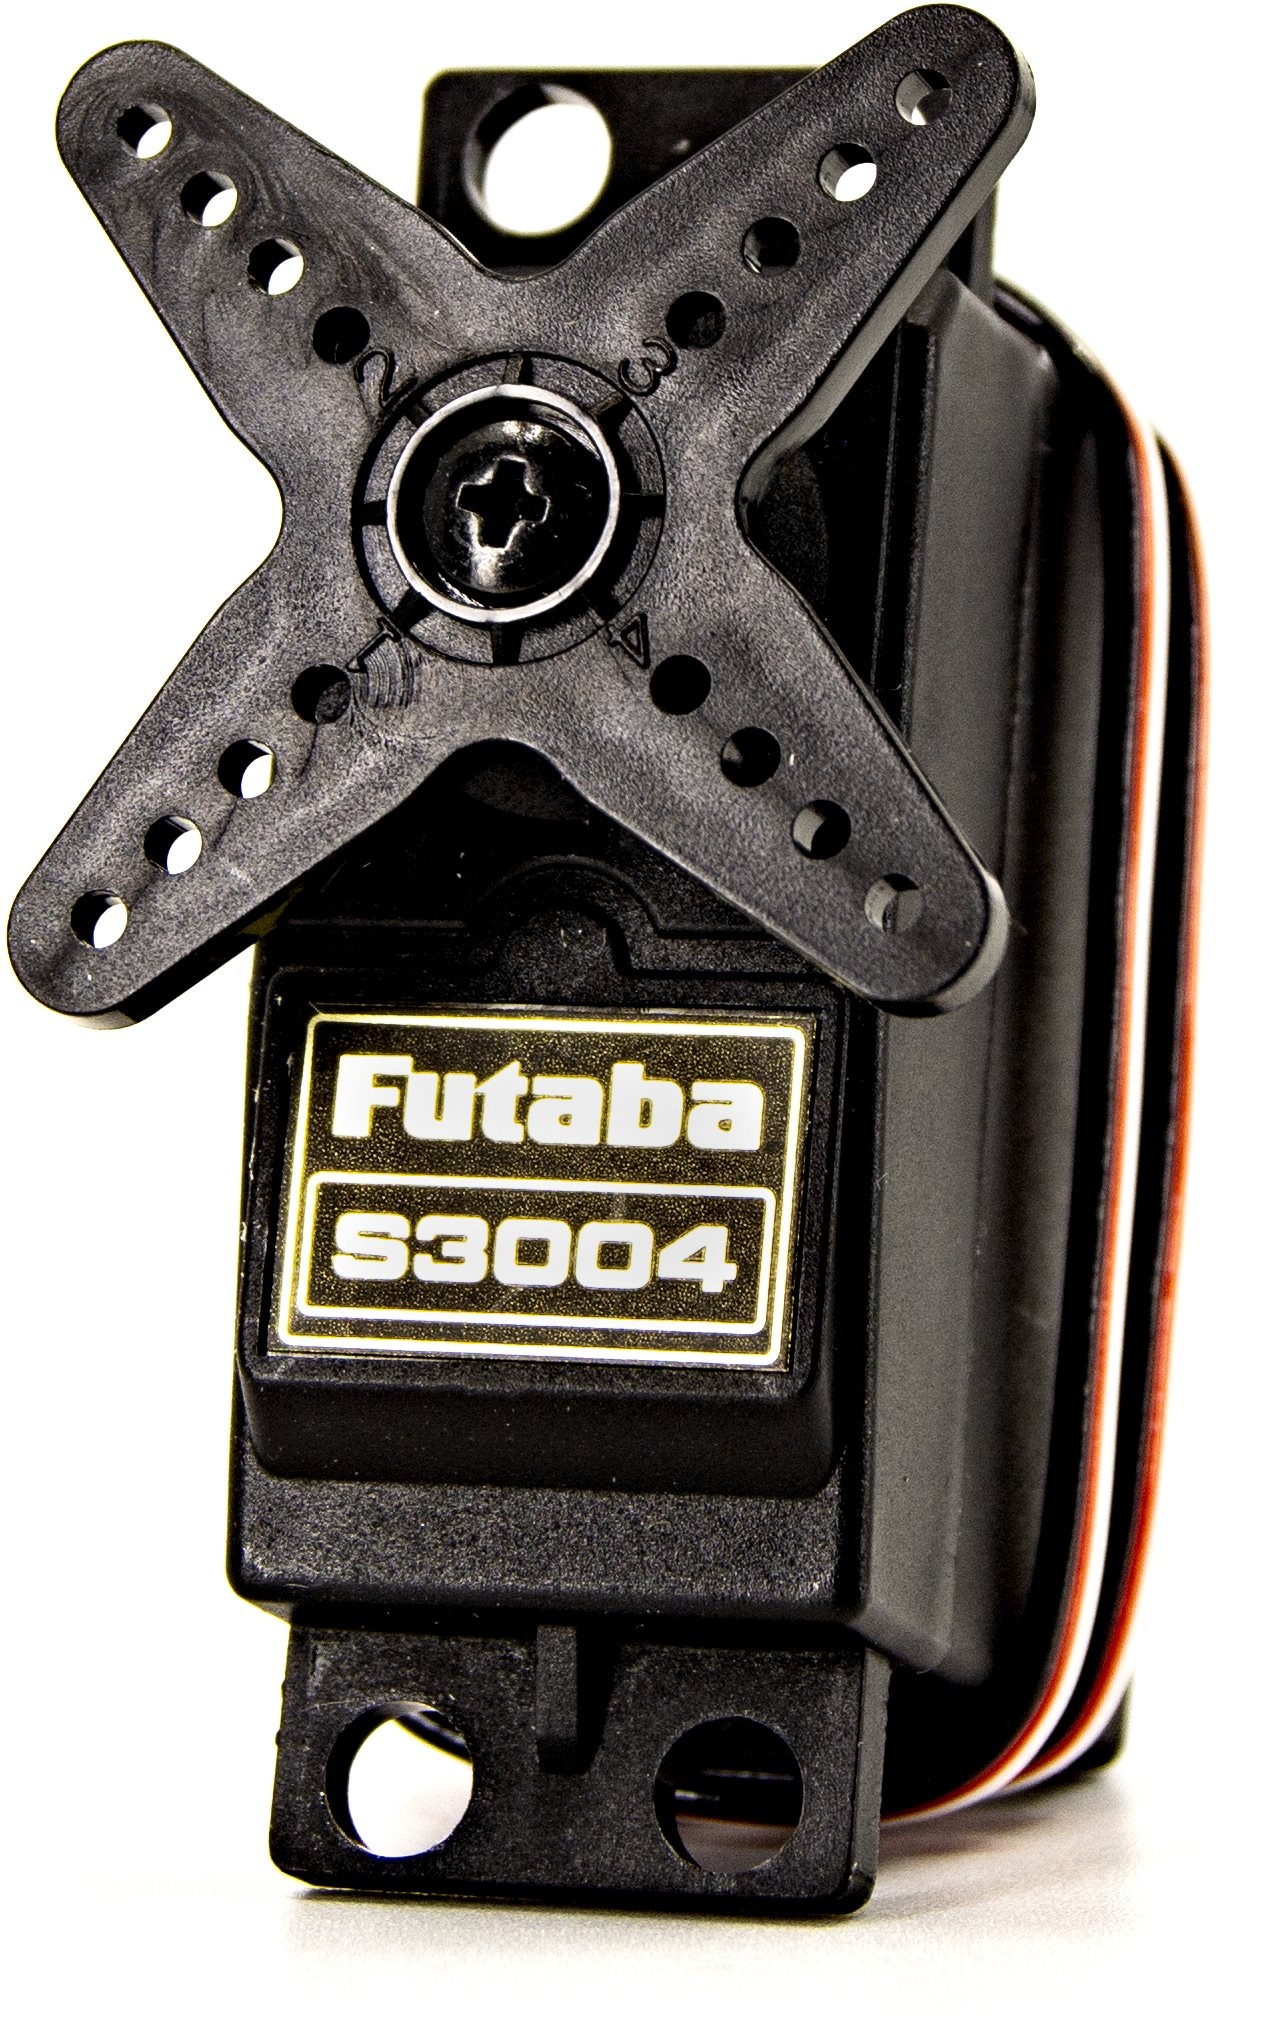 Futaba S3004 Standard Ball Bearing Servo .19Sec/56.9Oz @ 6V